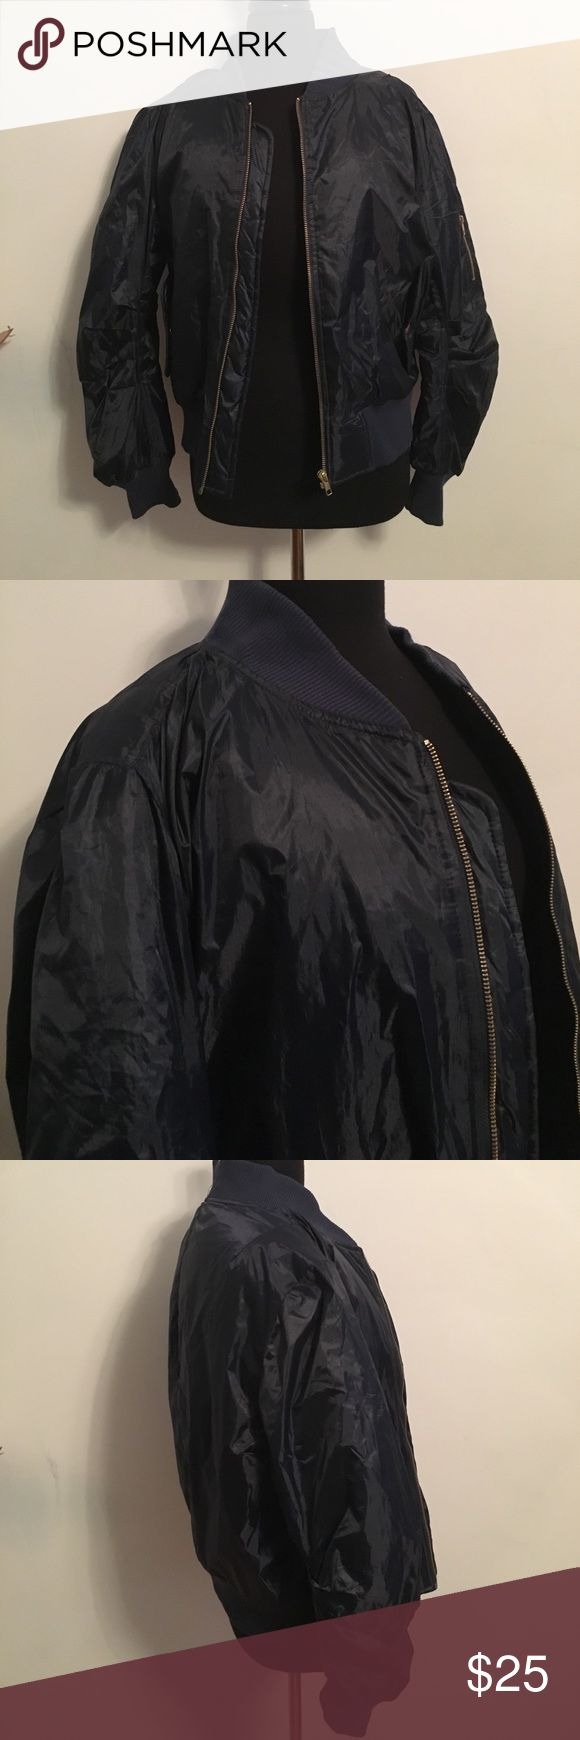 Influence Navy Bomber Jacket Chest: 42 inches Length: 23 inches Slim fit Influence Jackets & Coats Bomber & Varsity